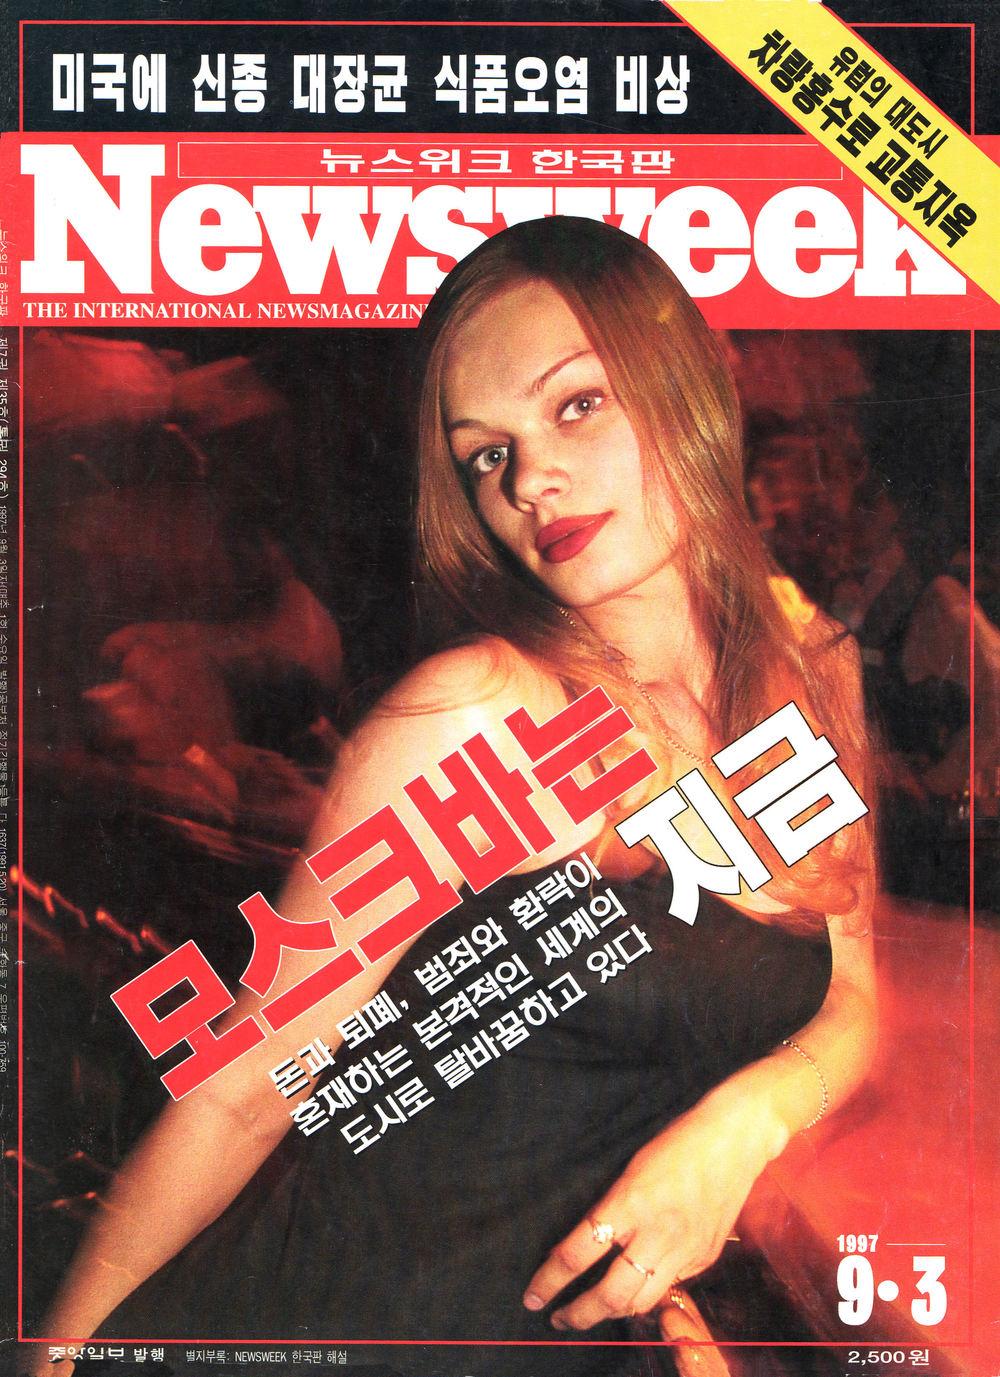 1997-3 Newsweek cover.jpg